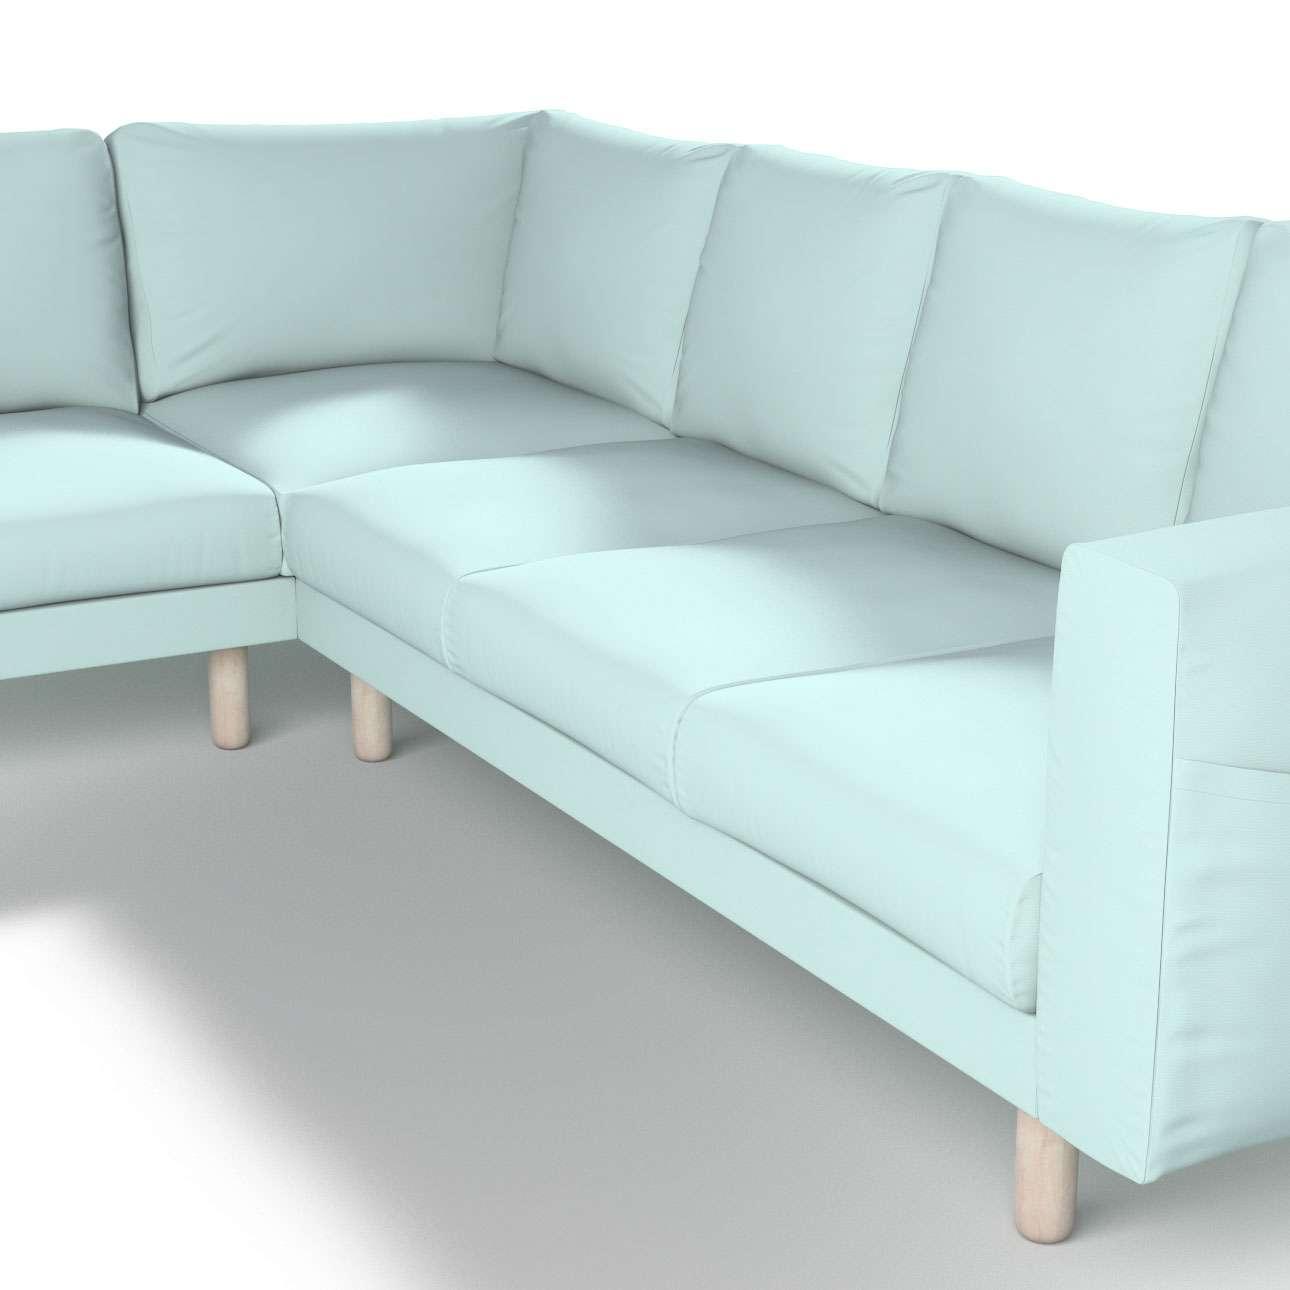 norsborg 5 sitzer ecksofabezug hellblau dekoria. Black Bedroom Furniture Sets. Home Design Ideas